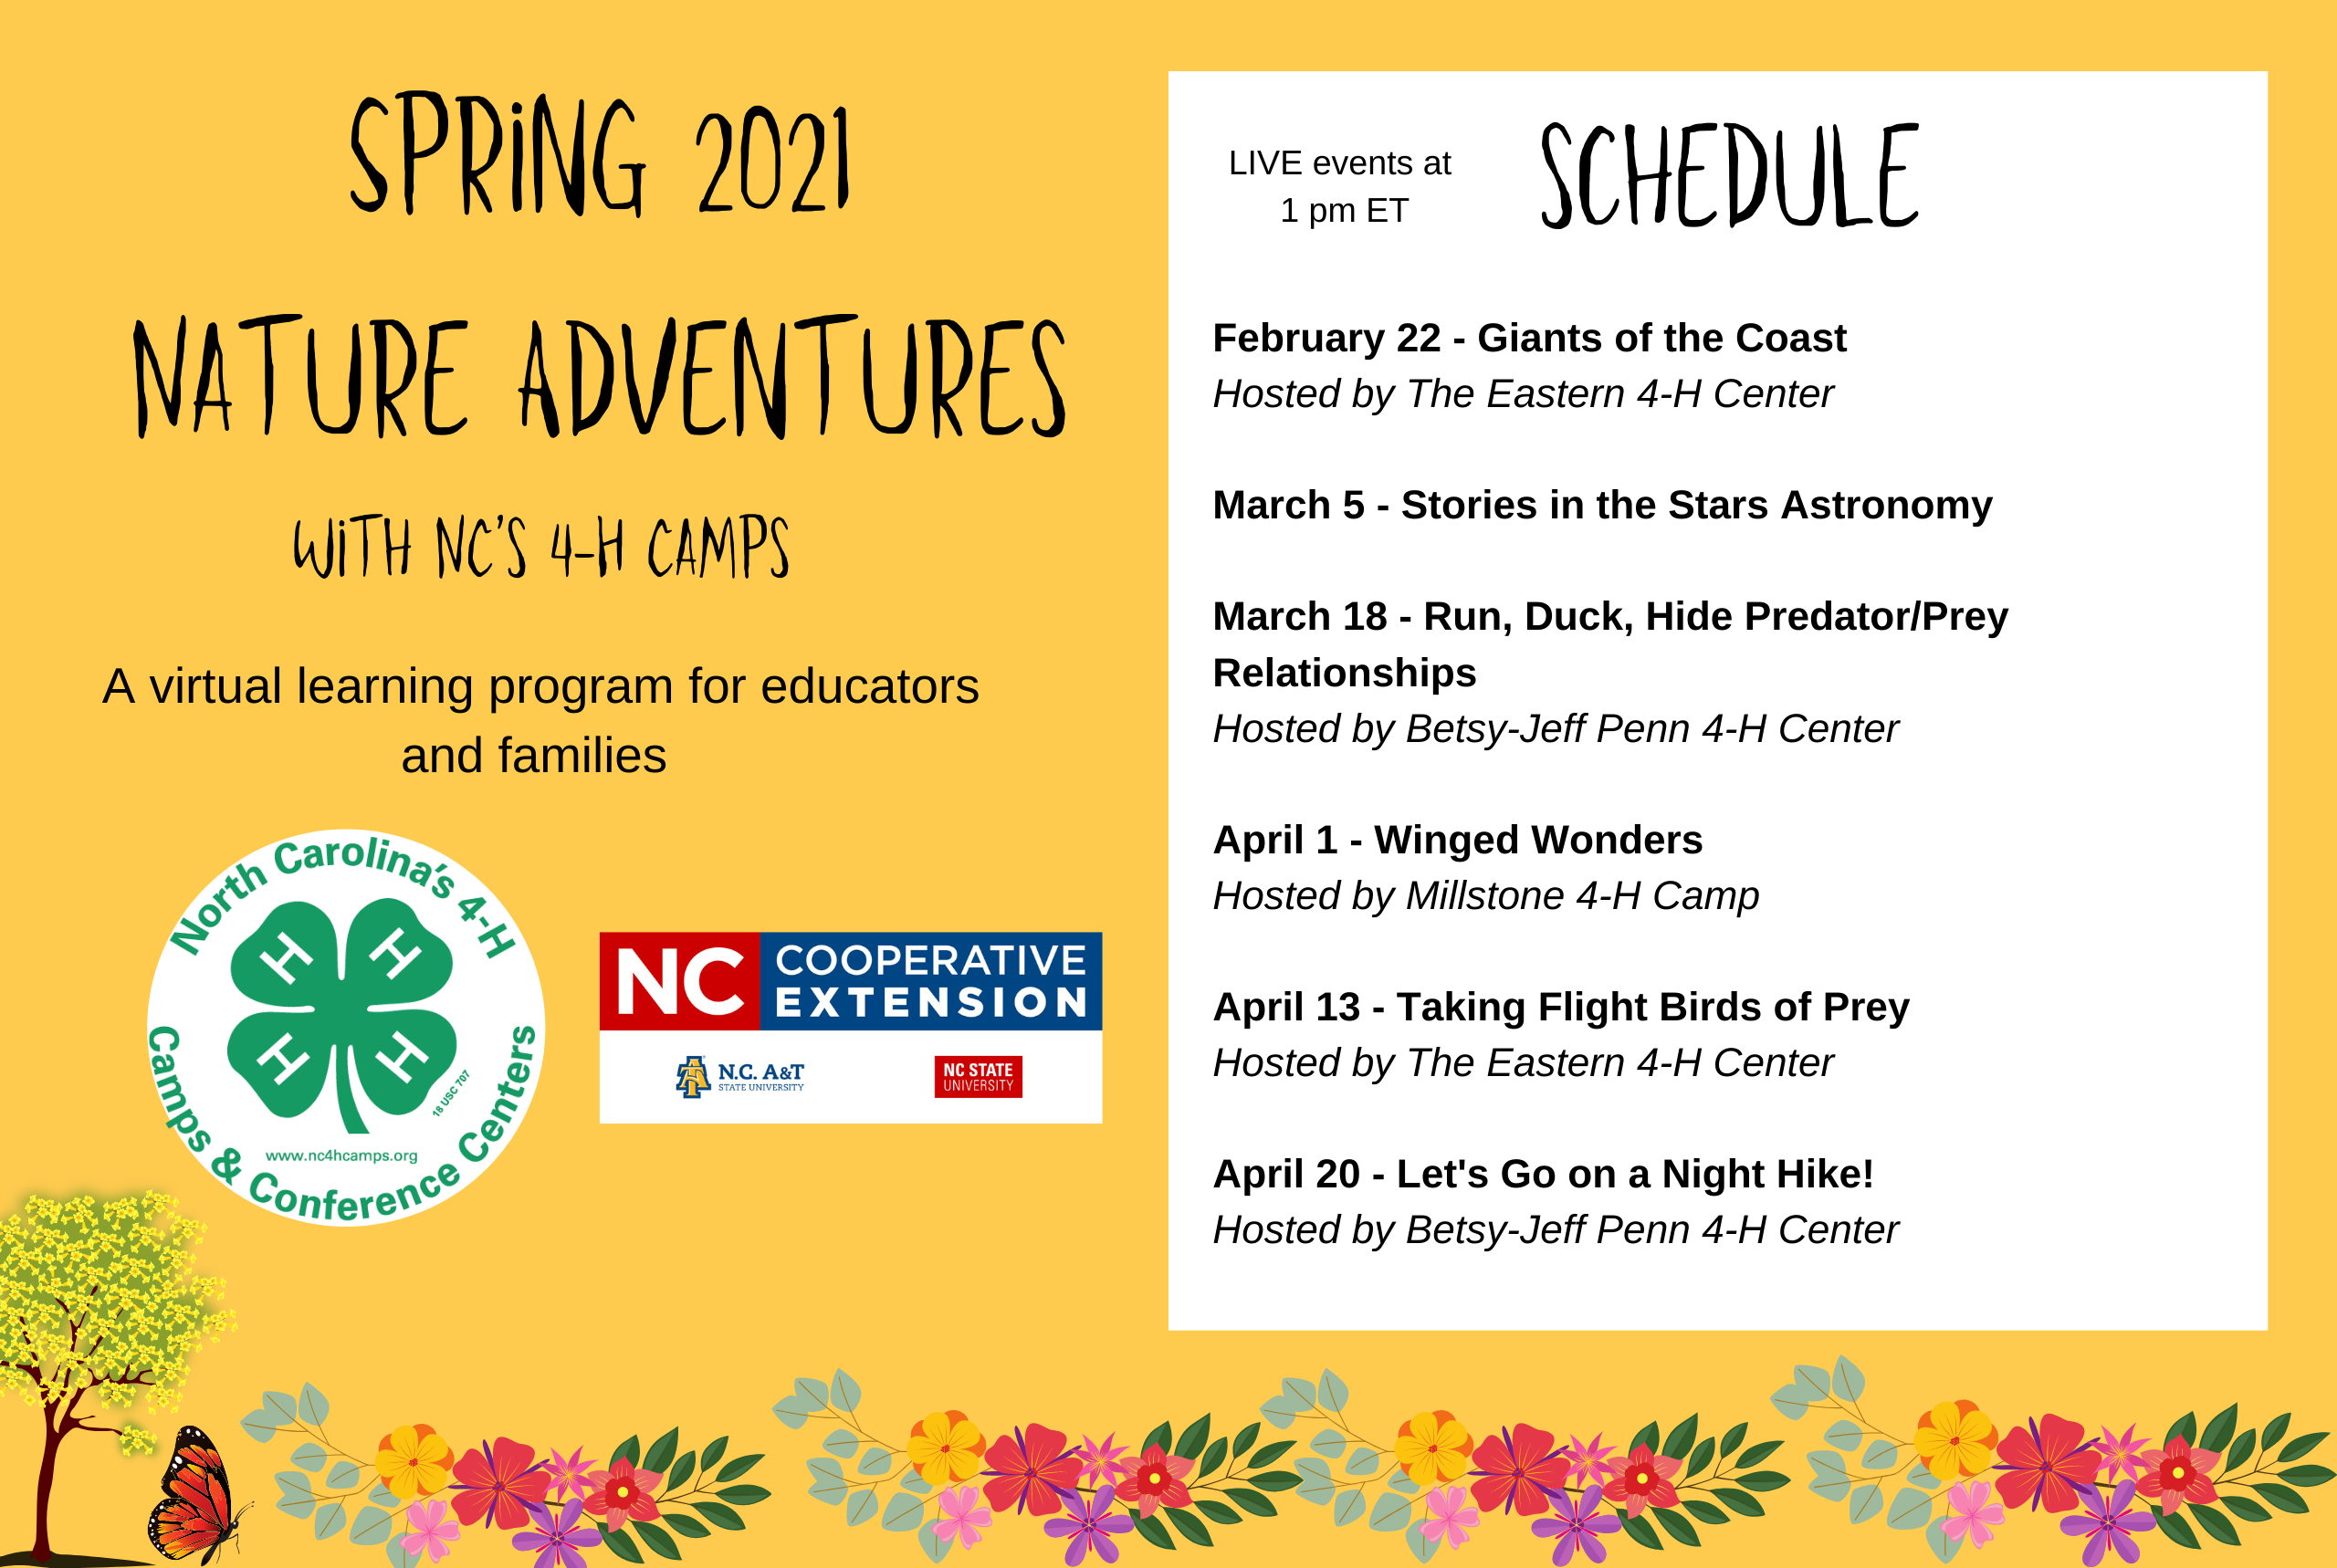 Spring 2021 Nature Adventures Schedule